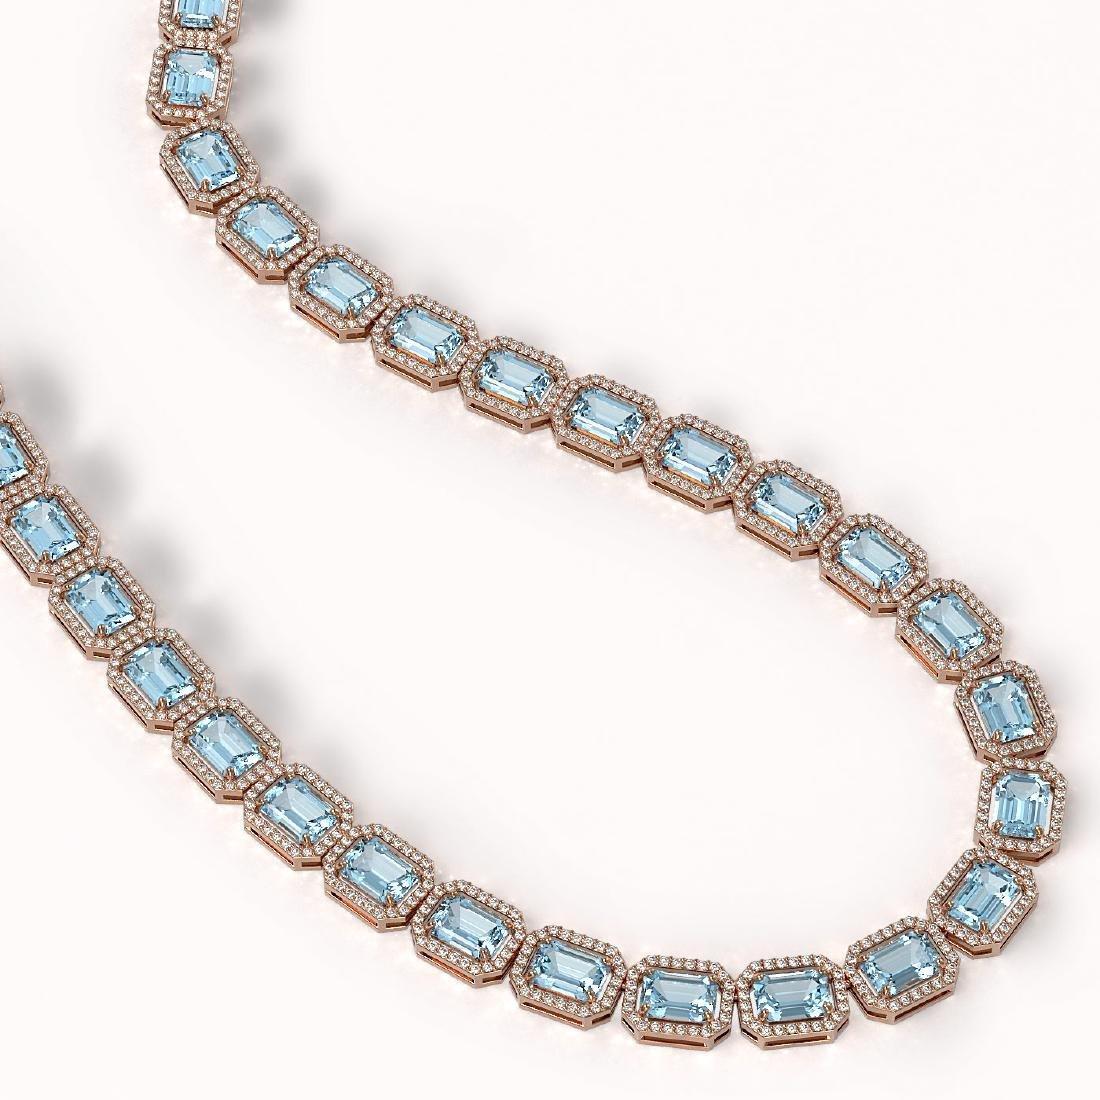 54.79 CTW Aquamarine & Diamond Halo Necklace 10K Rose - 2